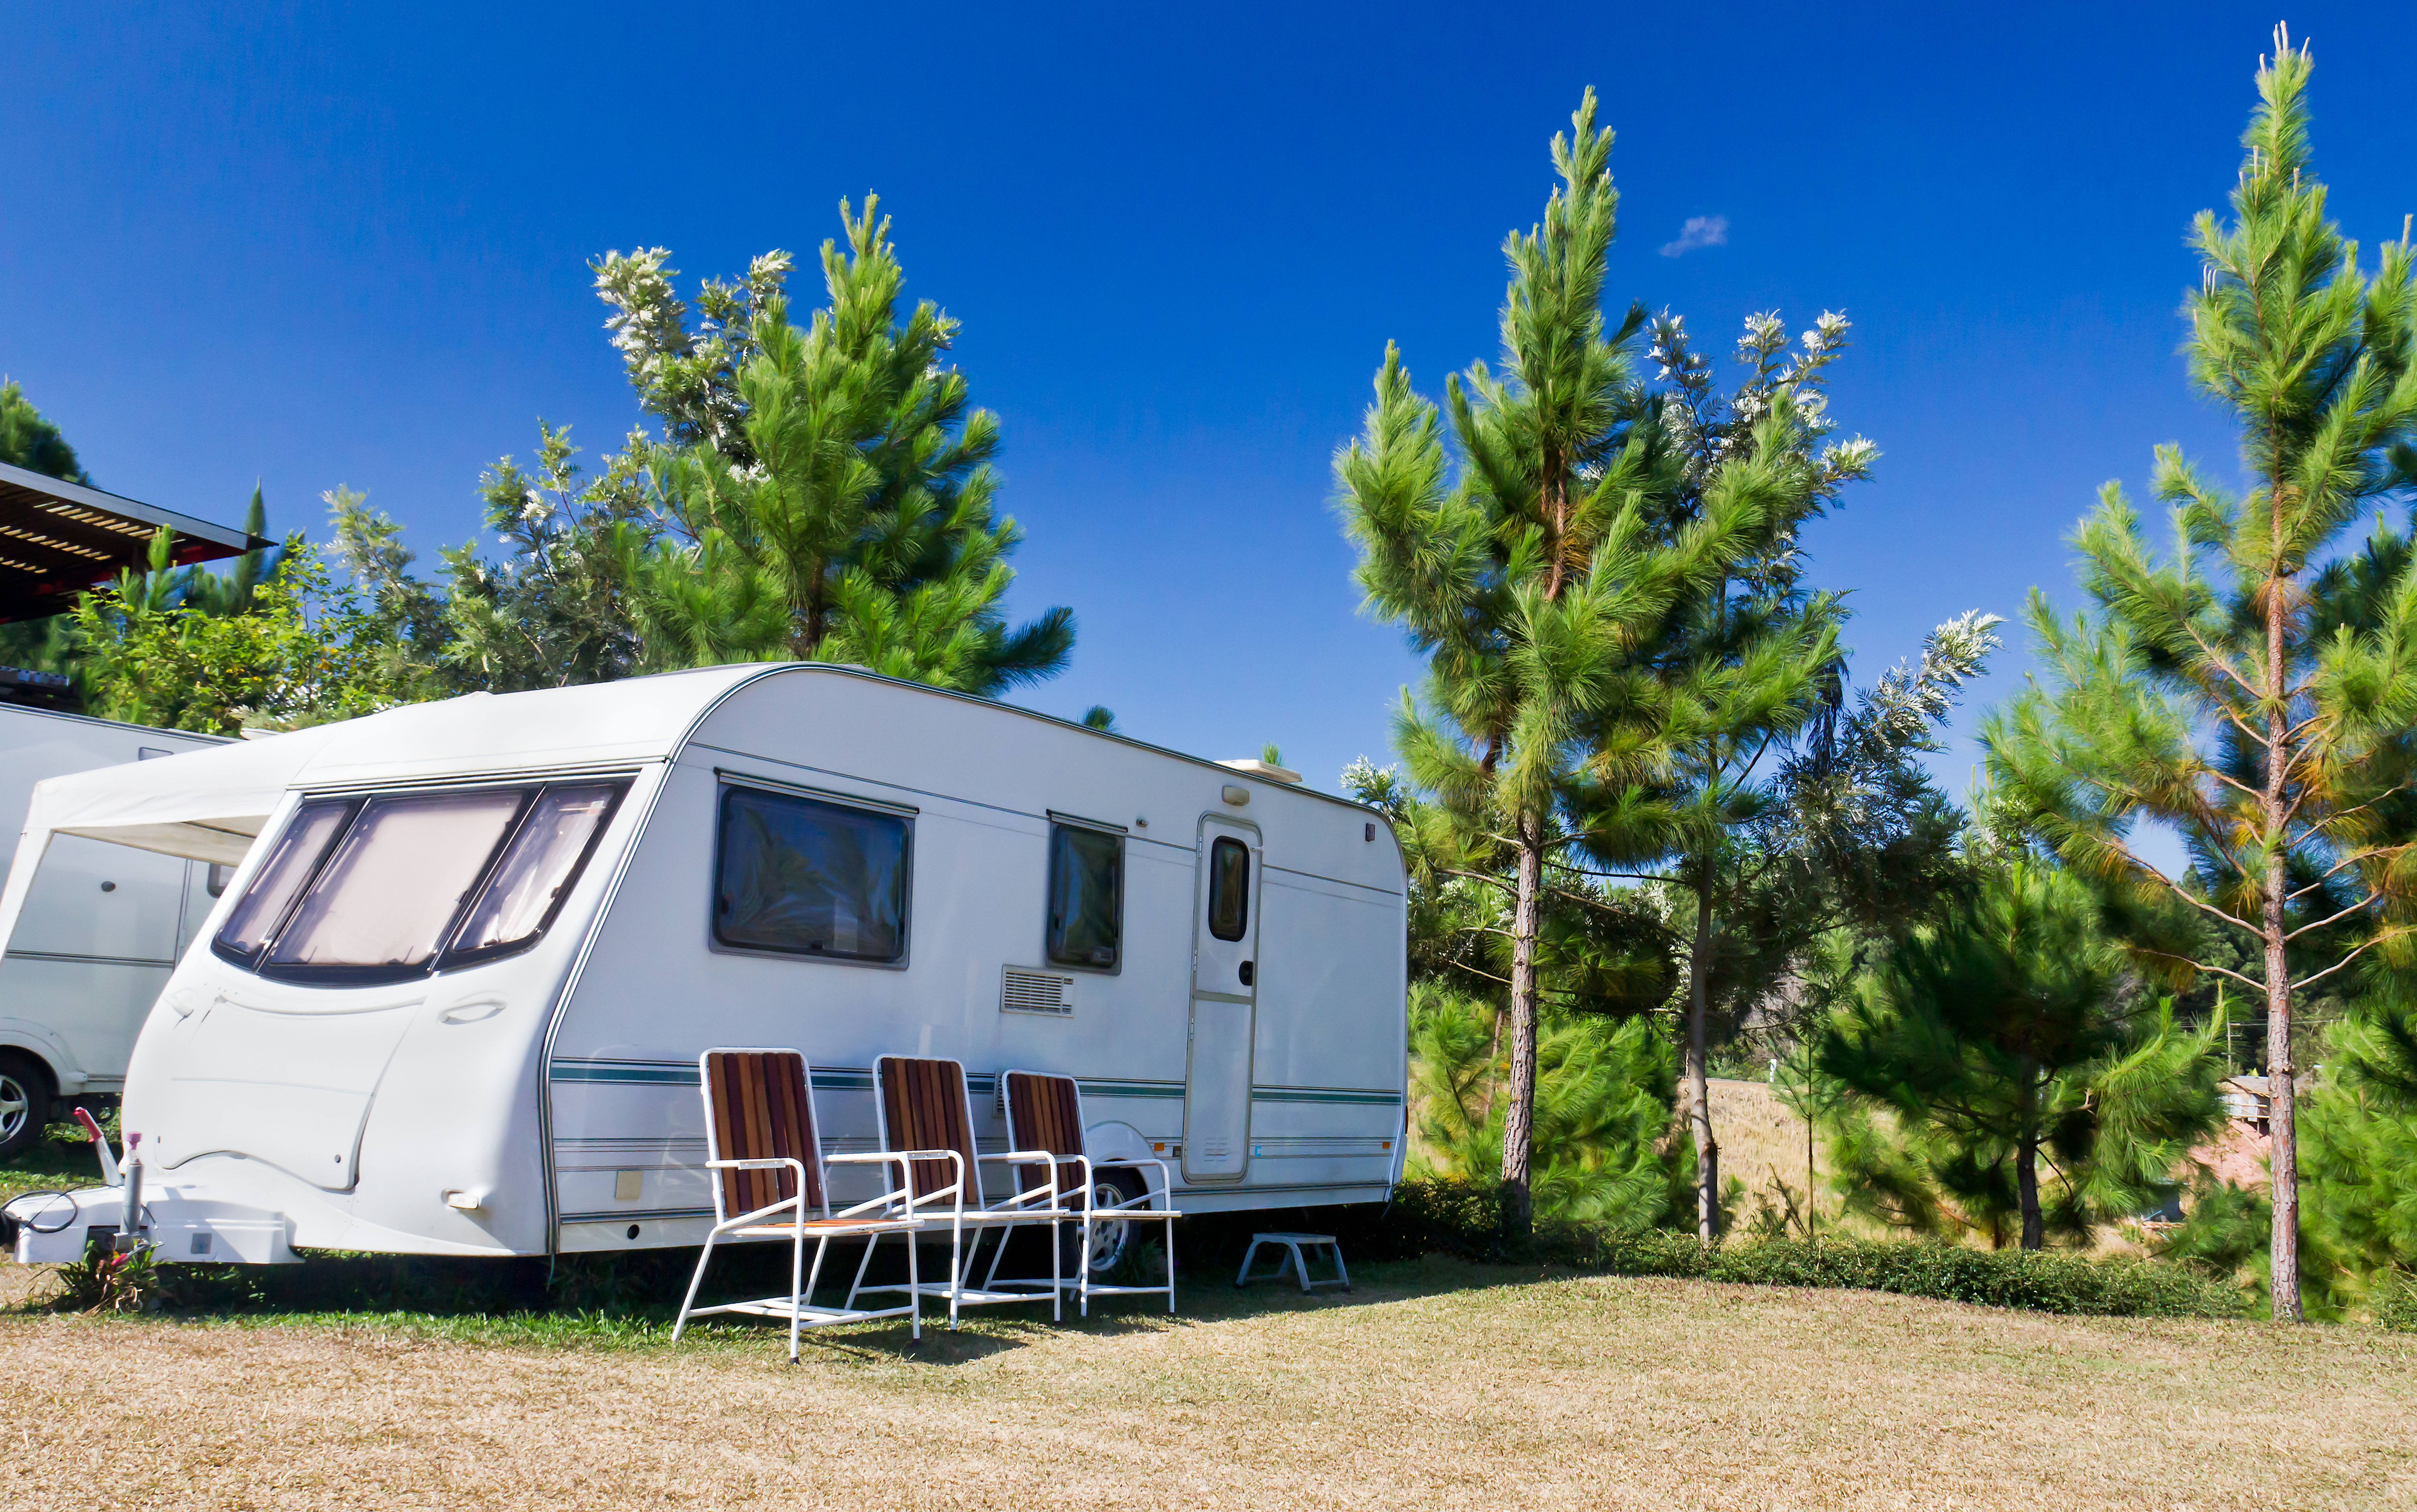 Caravan Park Finance